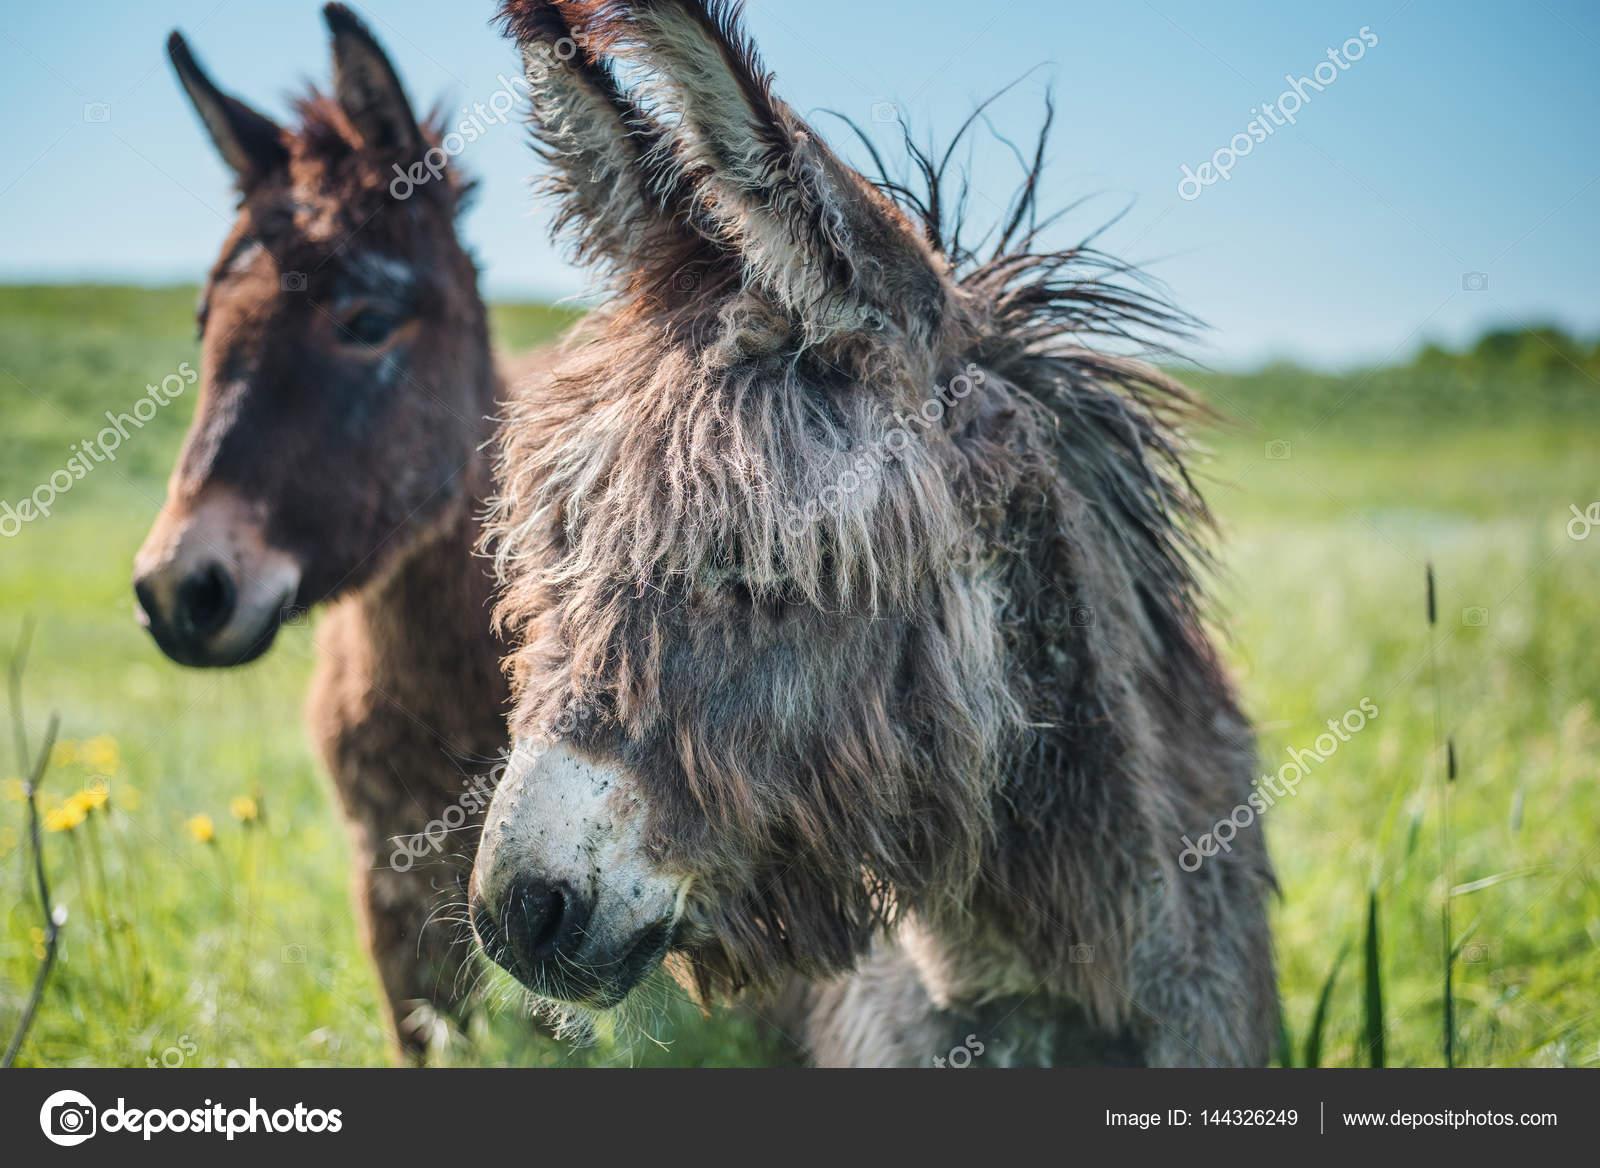 Afrikanska stora åsnor